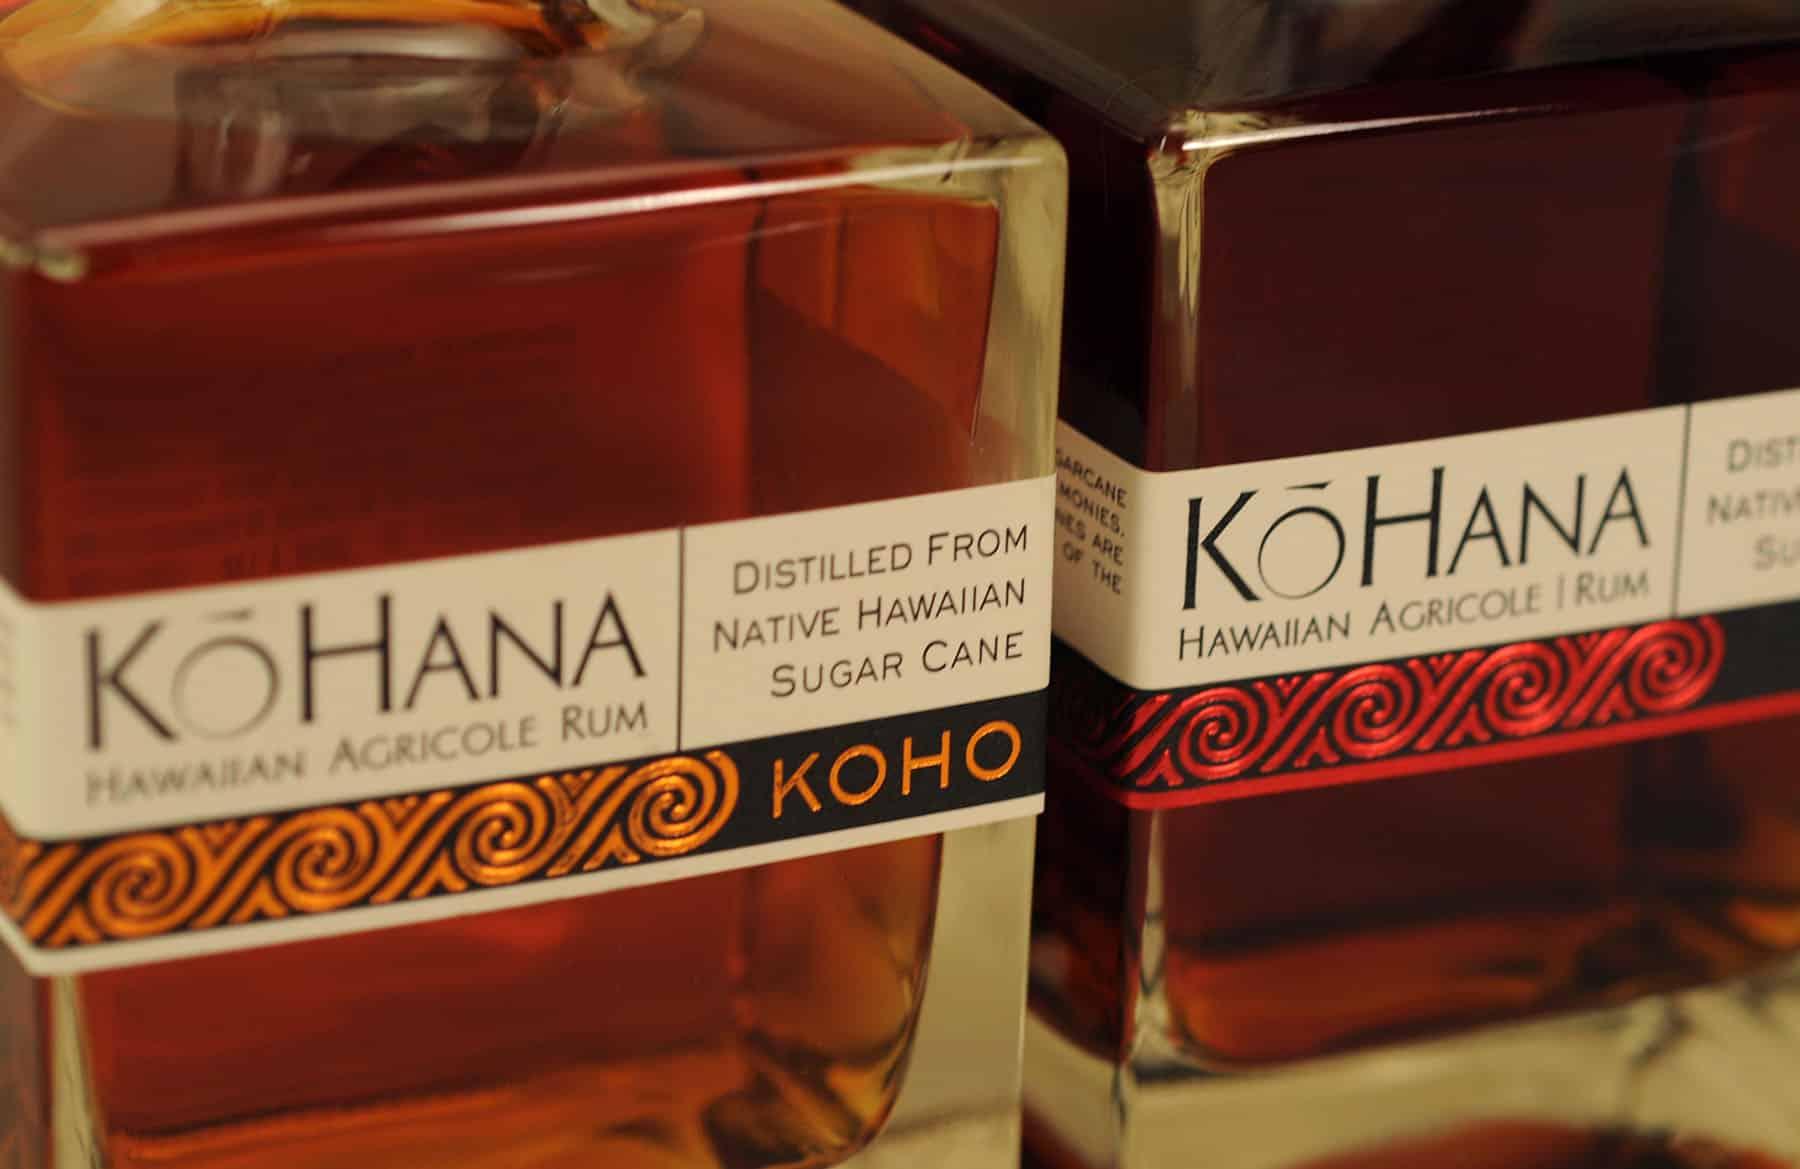 Kō Hana Hawaiian Agricole Rum bottles